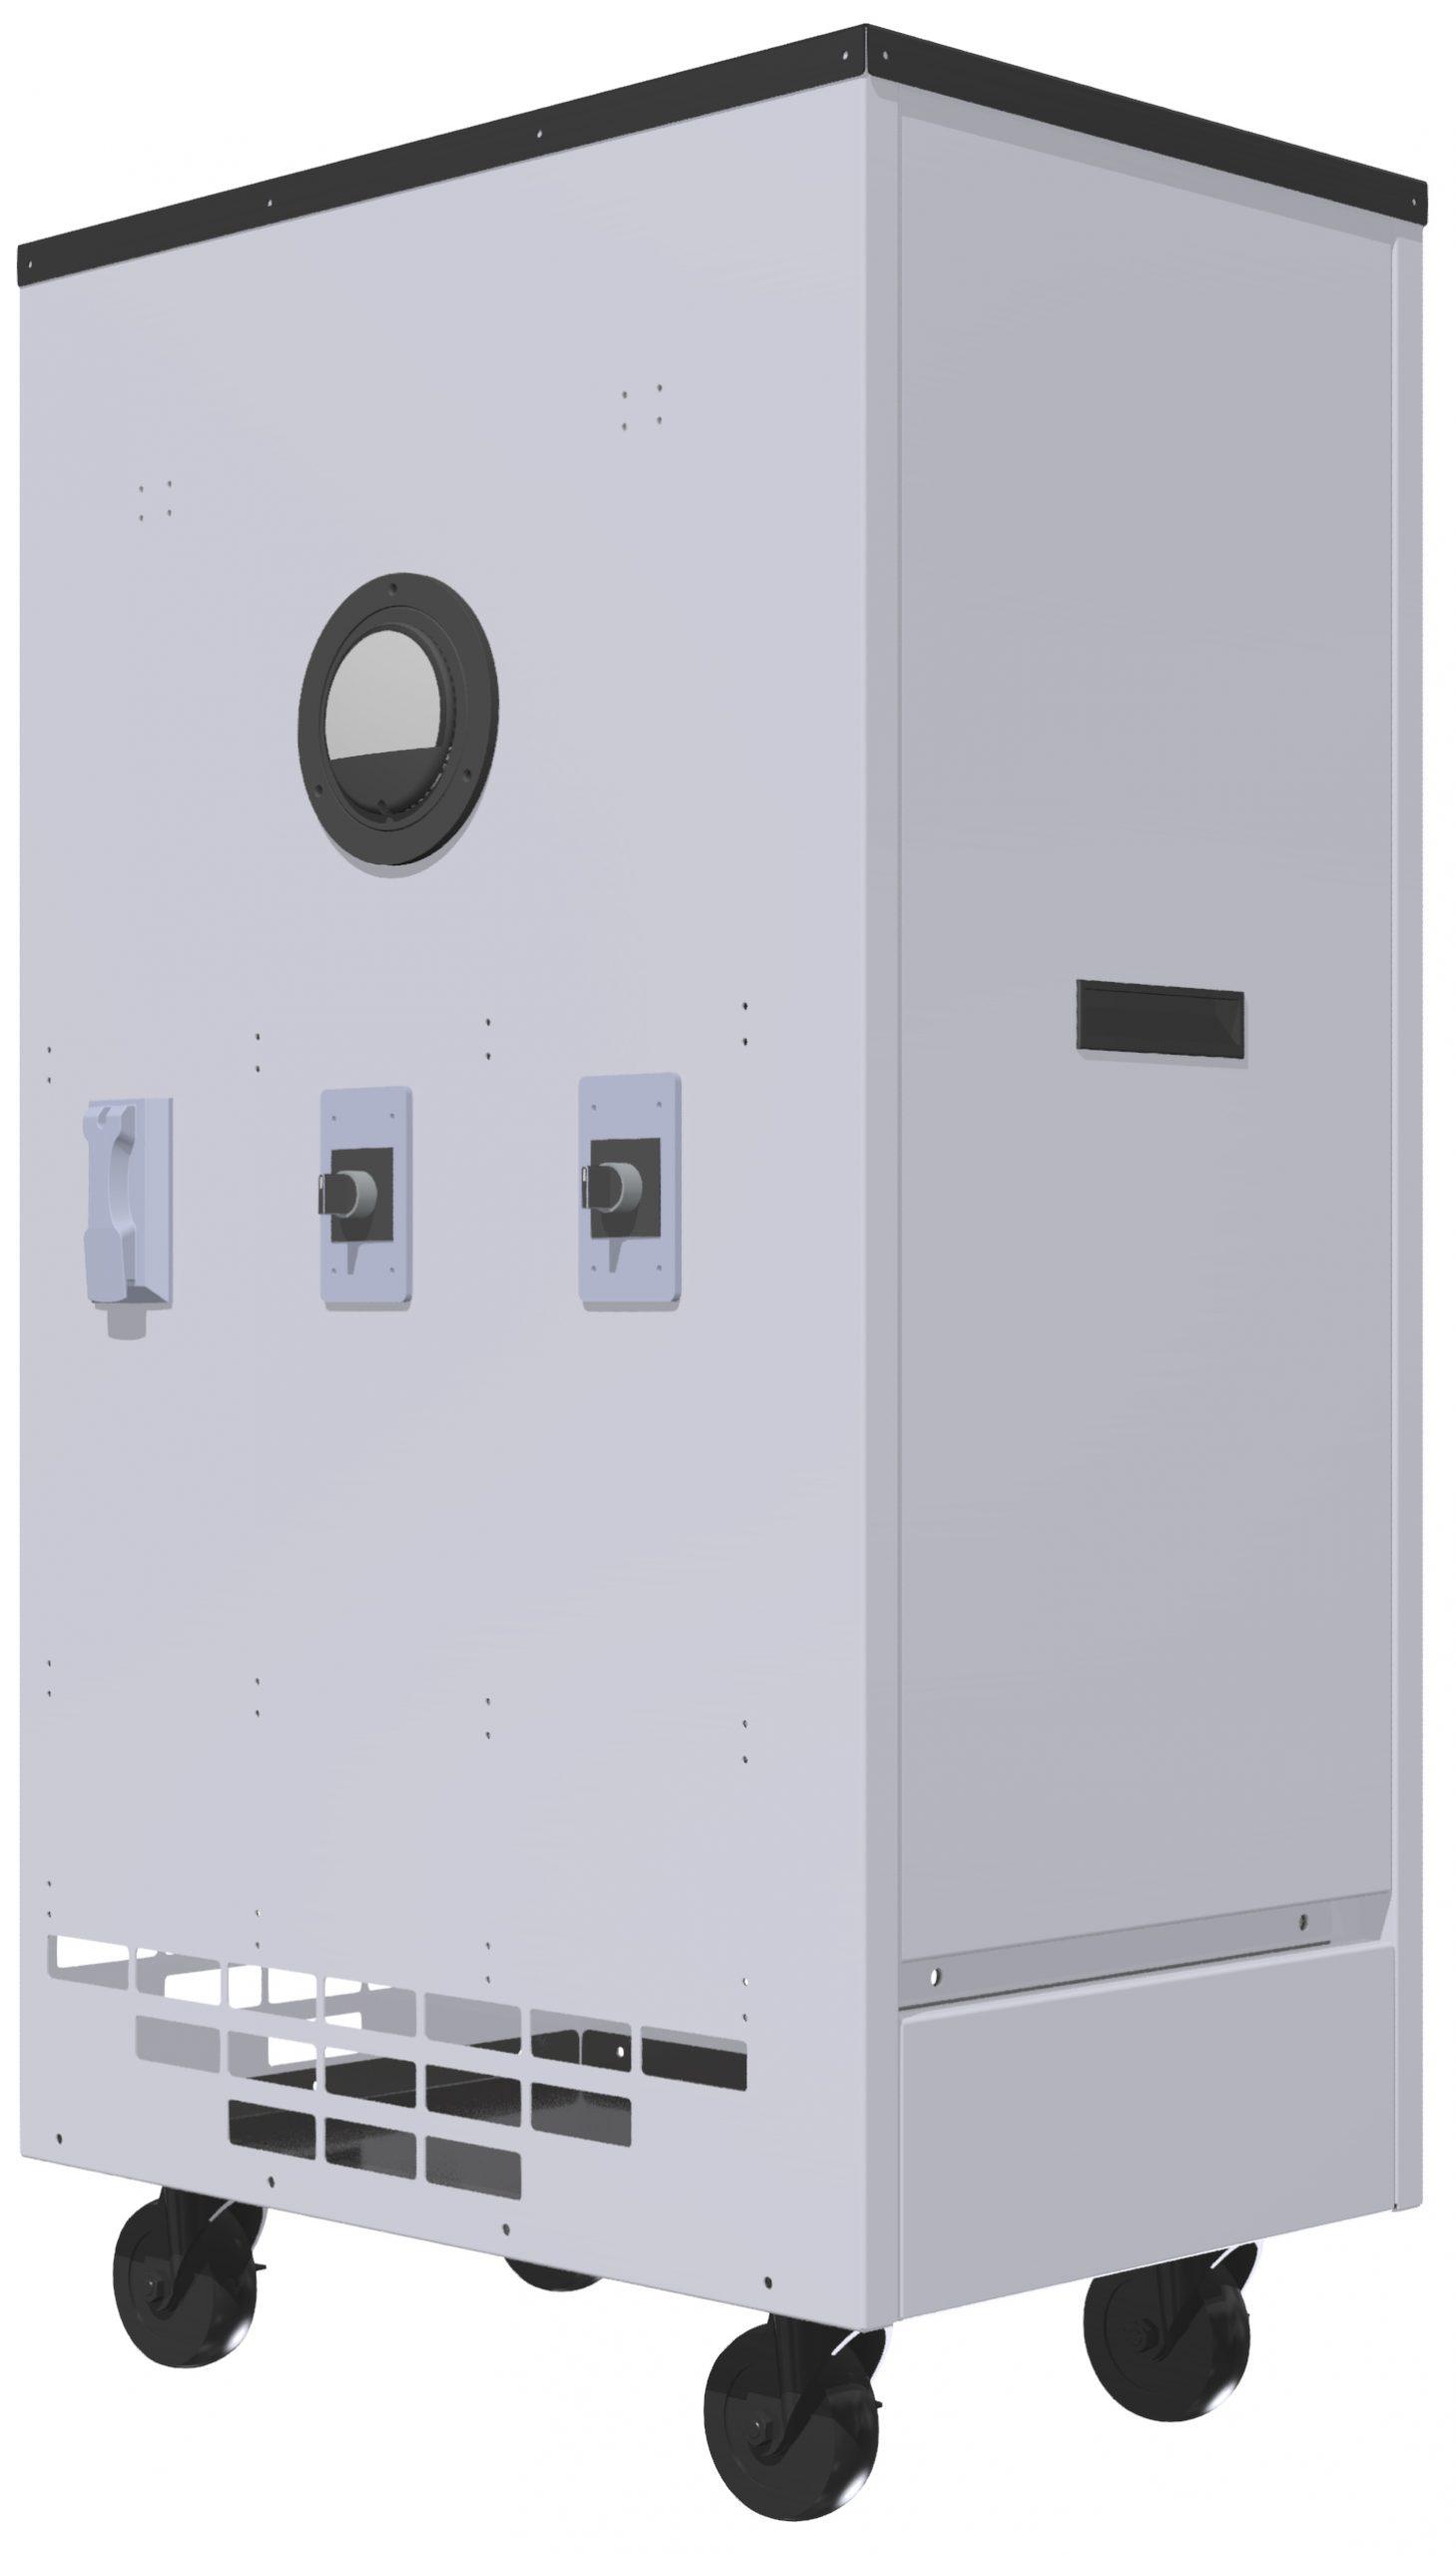 Portable Air Purifier 1000 - Portable air purifier 1000 1 scaled